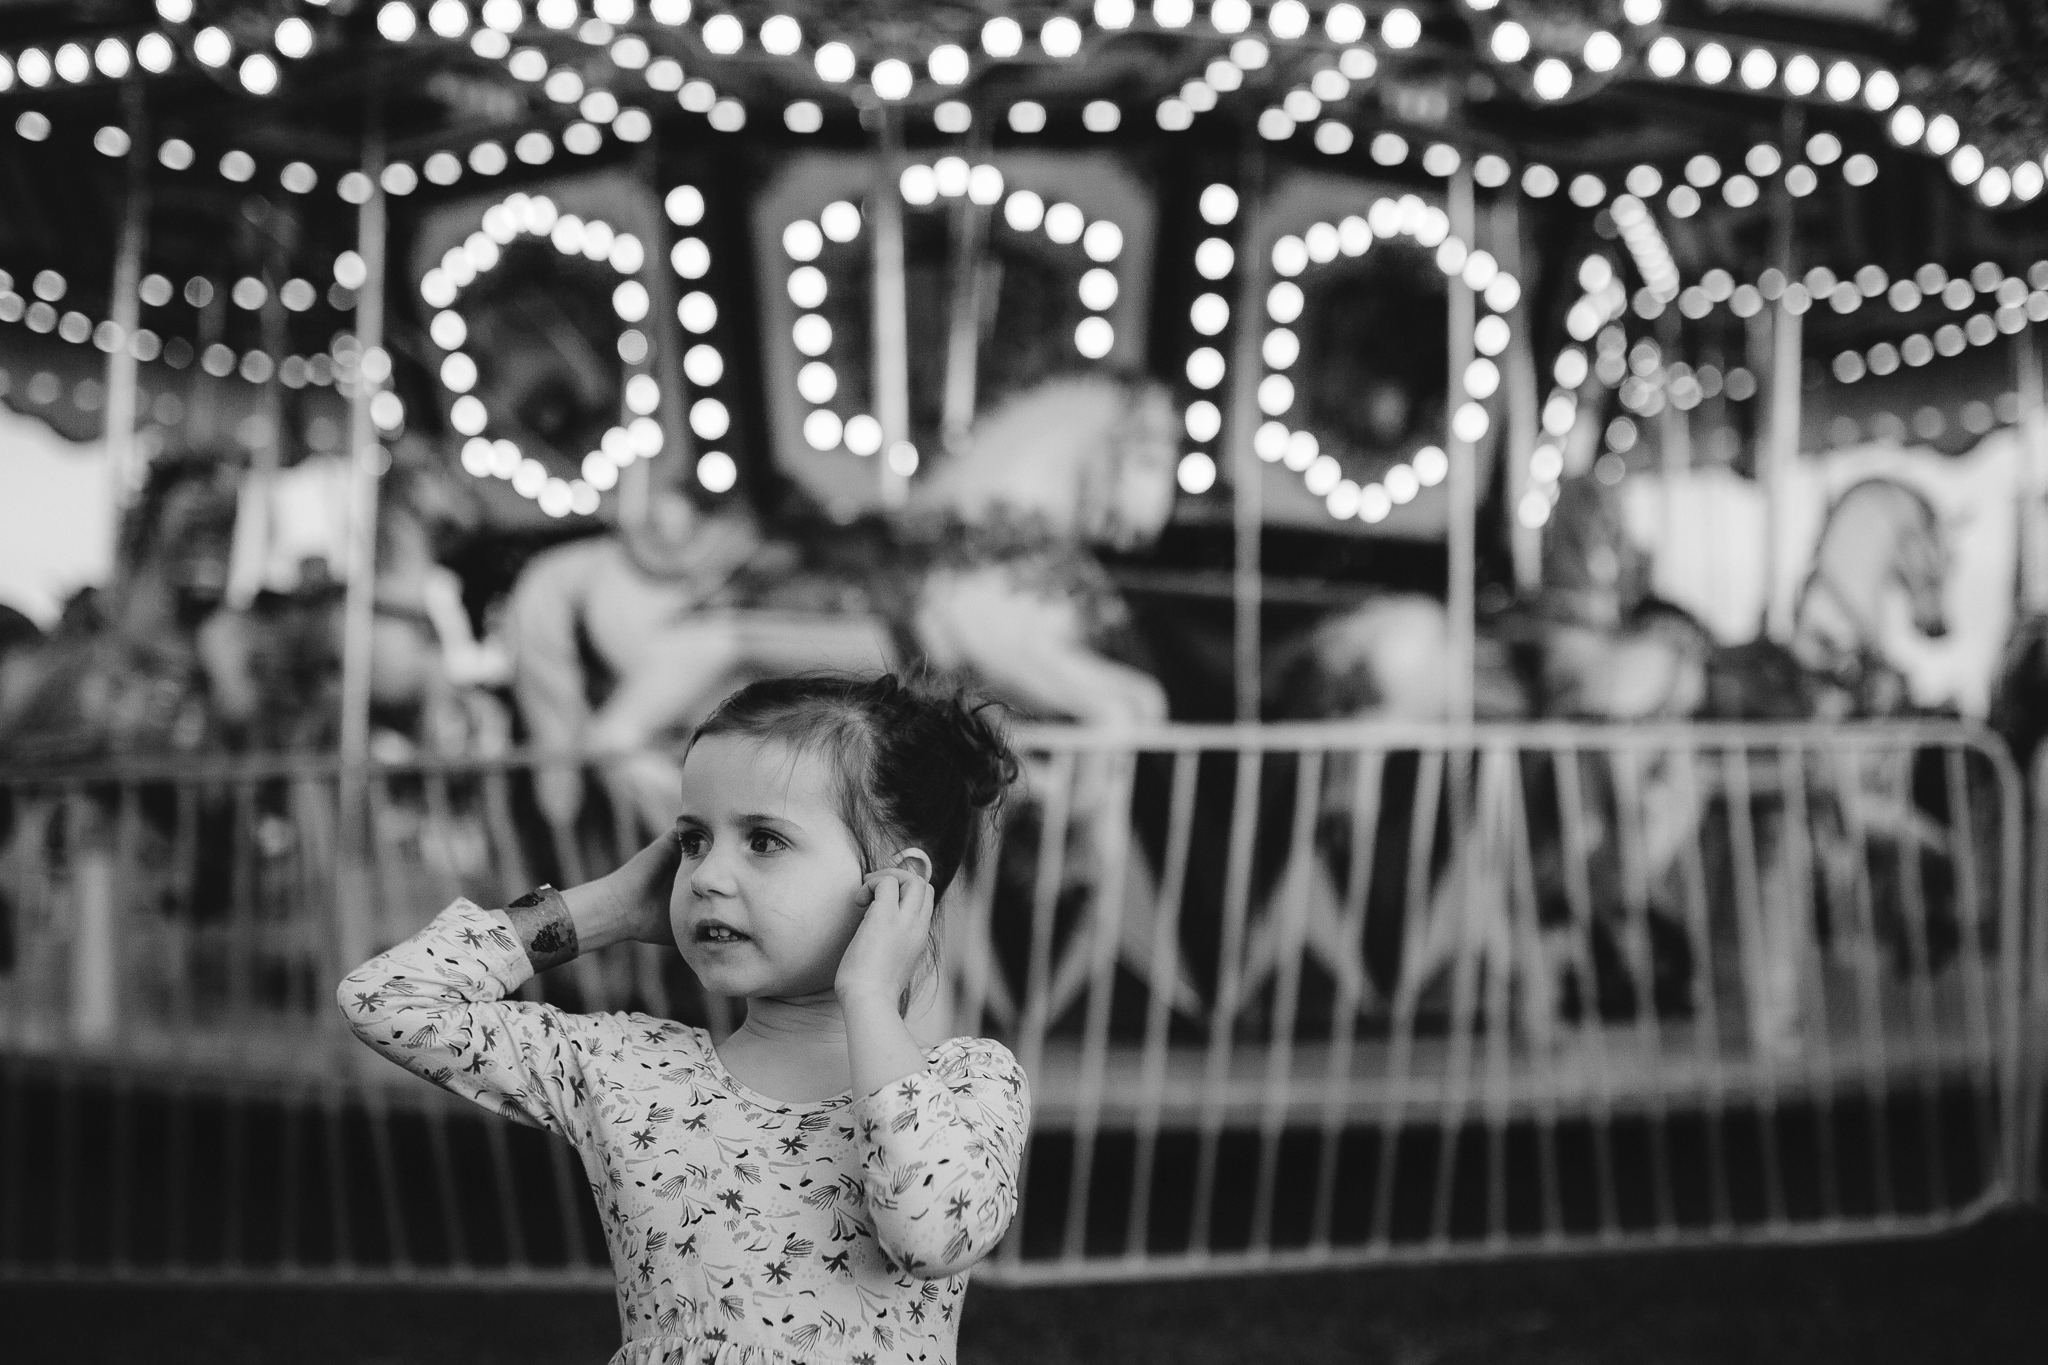 Black and white girl carnival merry go round carousel lights bokeh summer Ashburn Loudoun Northern Virginia family lifestyle documentary childhood Marti Austin Photography